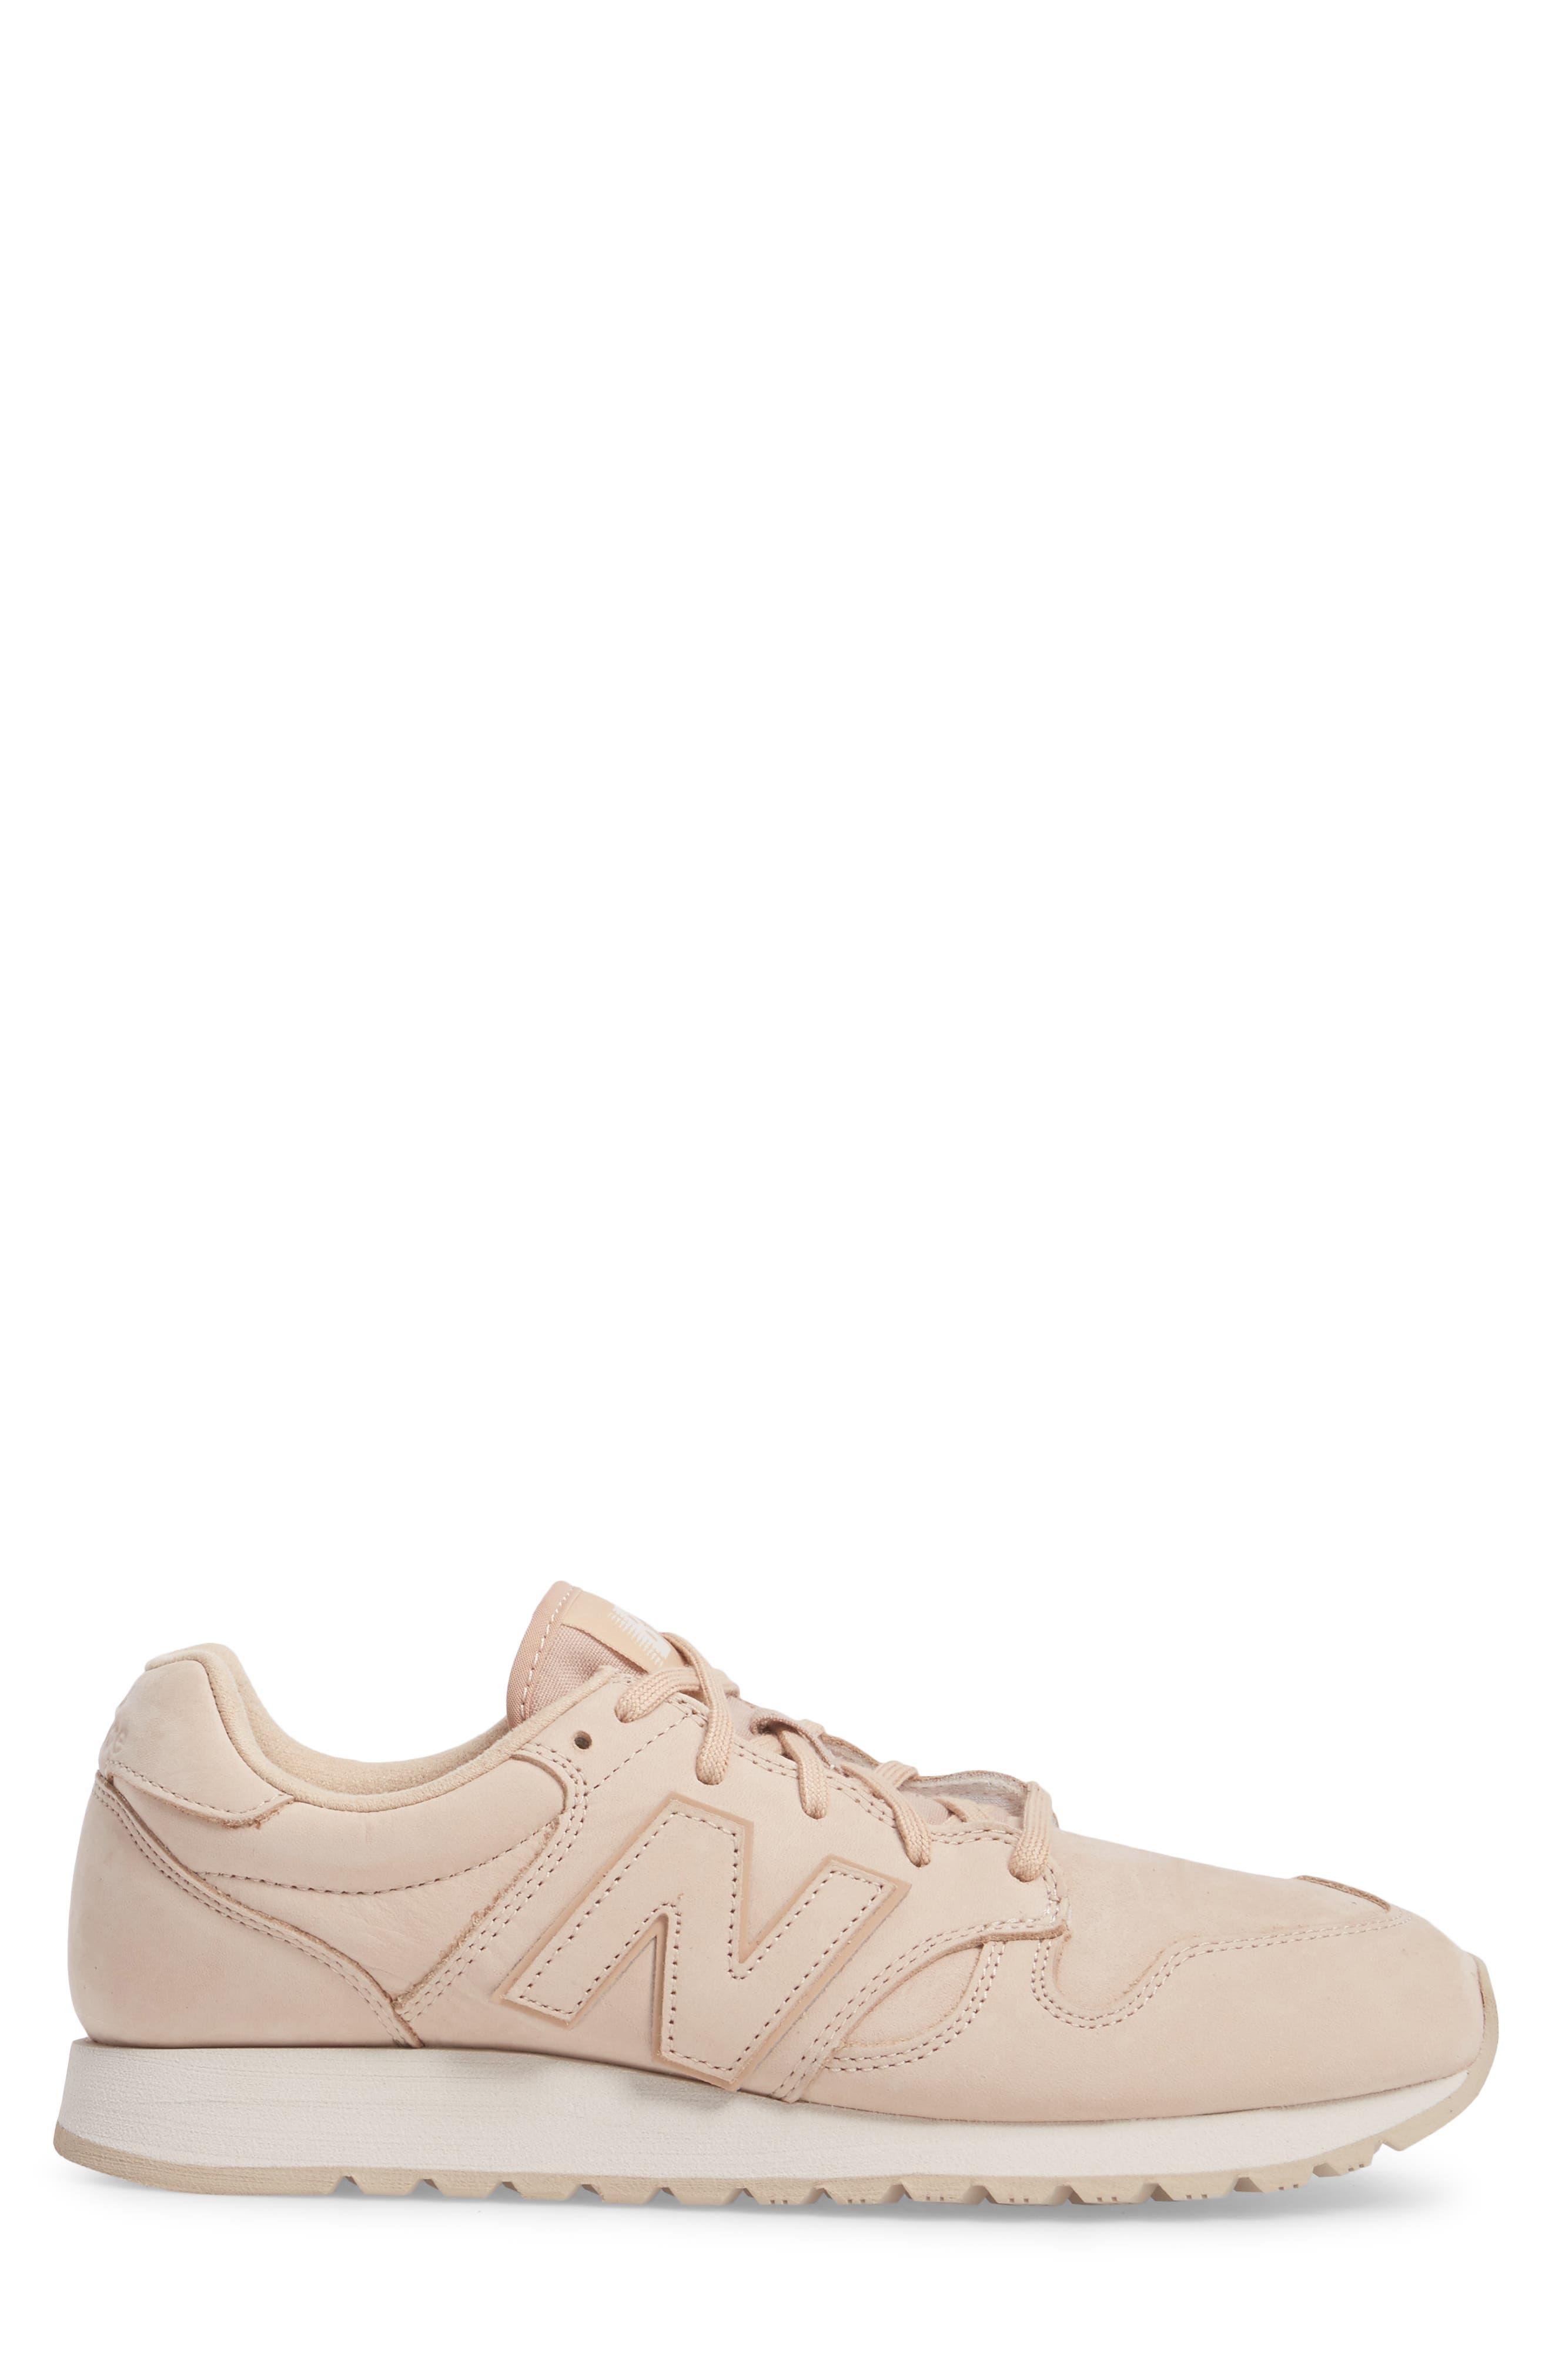 U520 Trainer Sneaker,                             Alternate thumbnail 6, color,